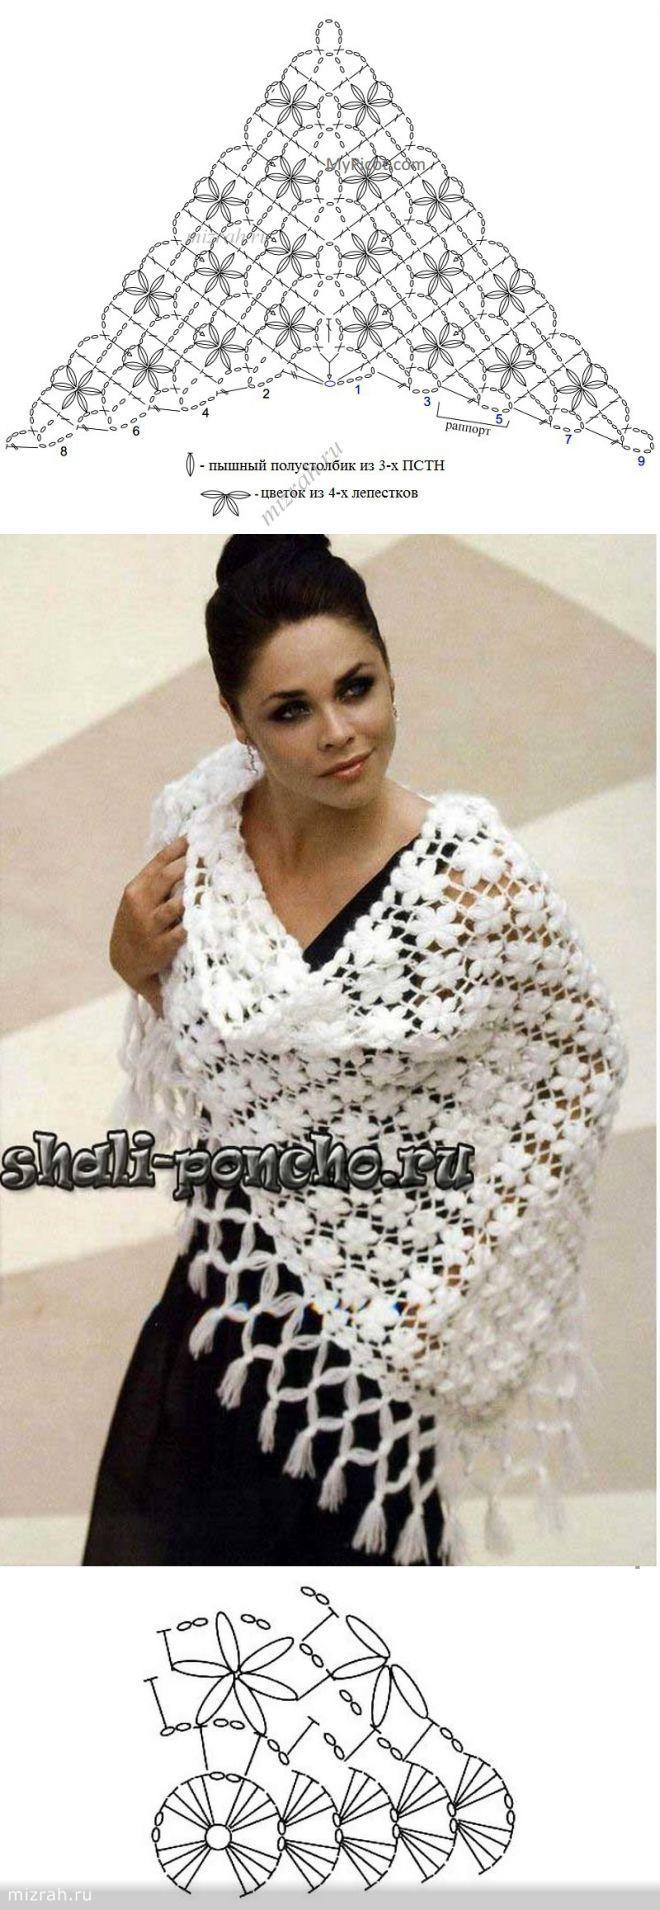 Fiori scialle crochet gross | Tejido | Pinterest | Chicas, Chal y ...